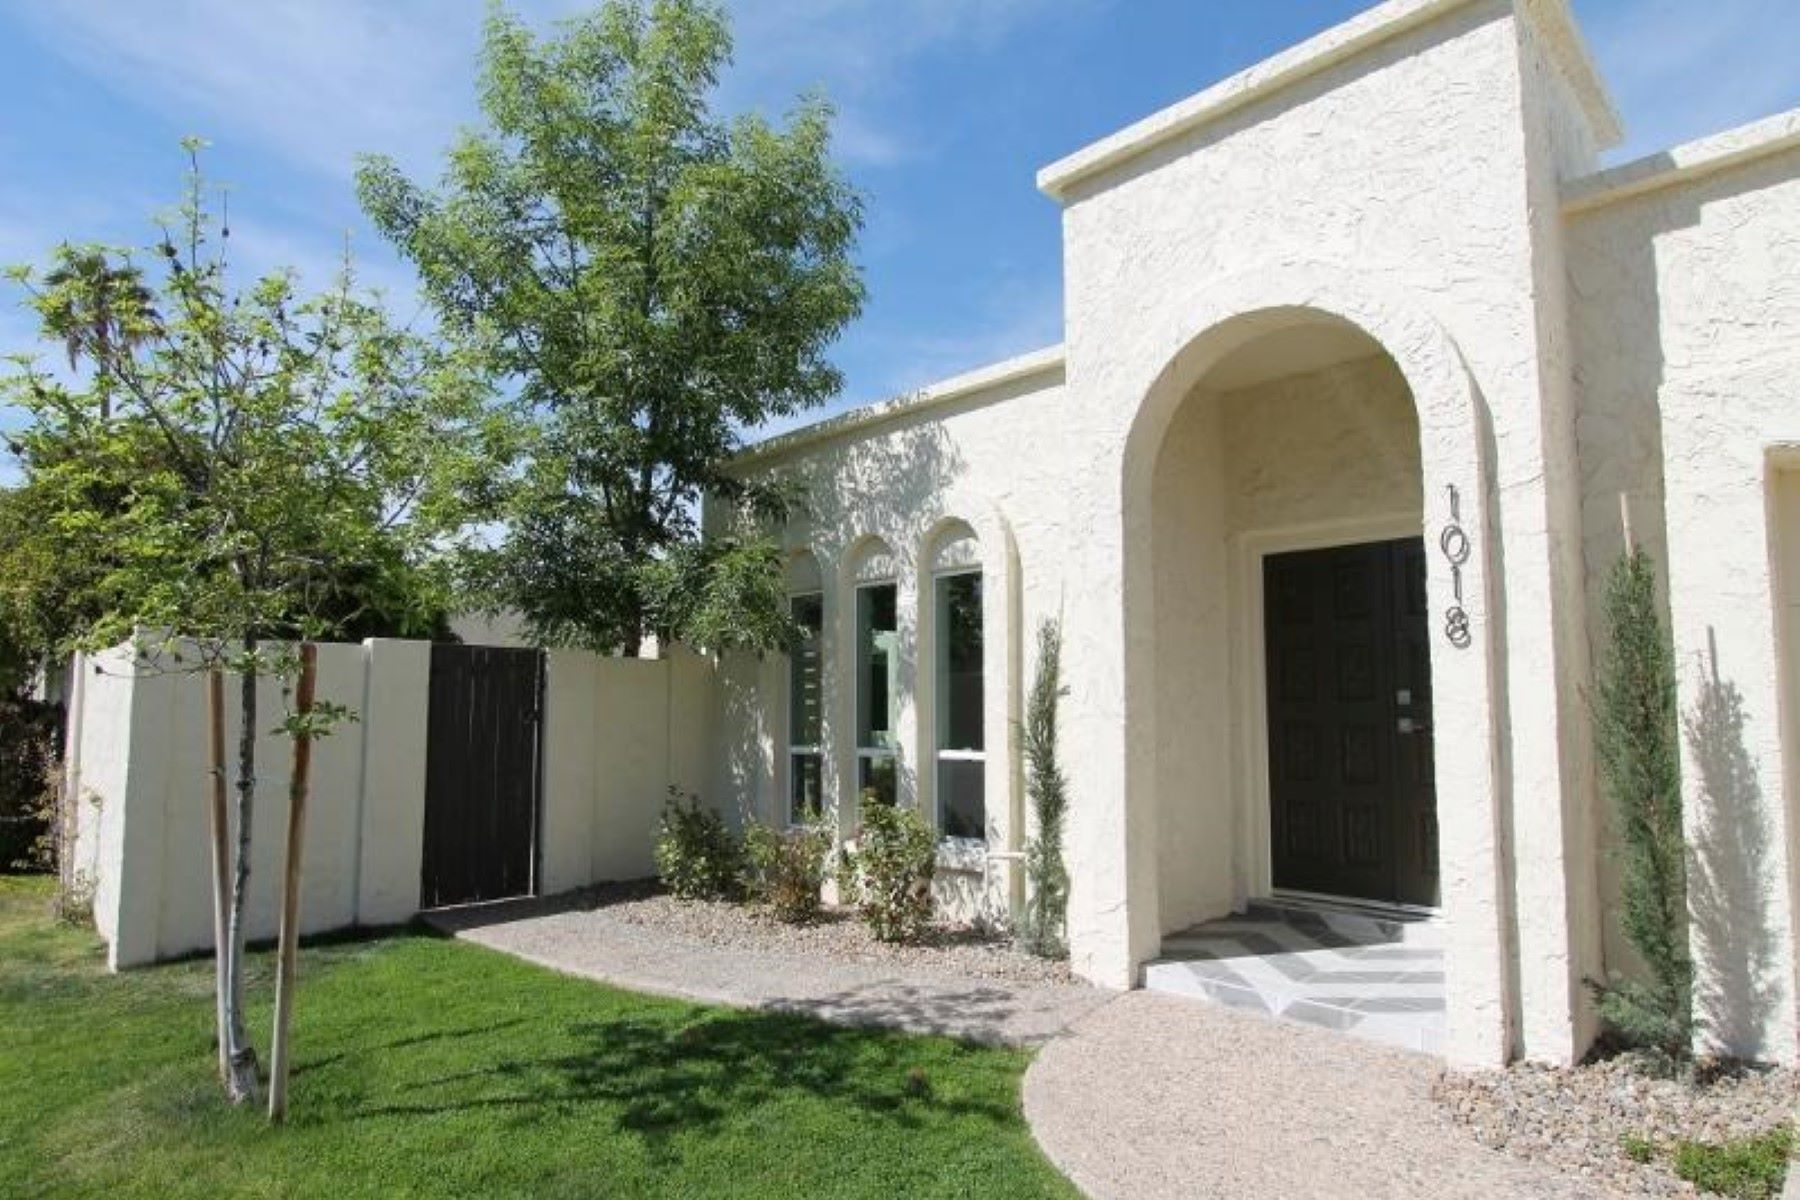 Moradia para Venda às Lovely single level patio home 1018 W Solar Dr Phoenix, Arizona, 85021 Estados Unidos